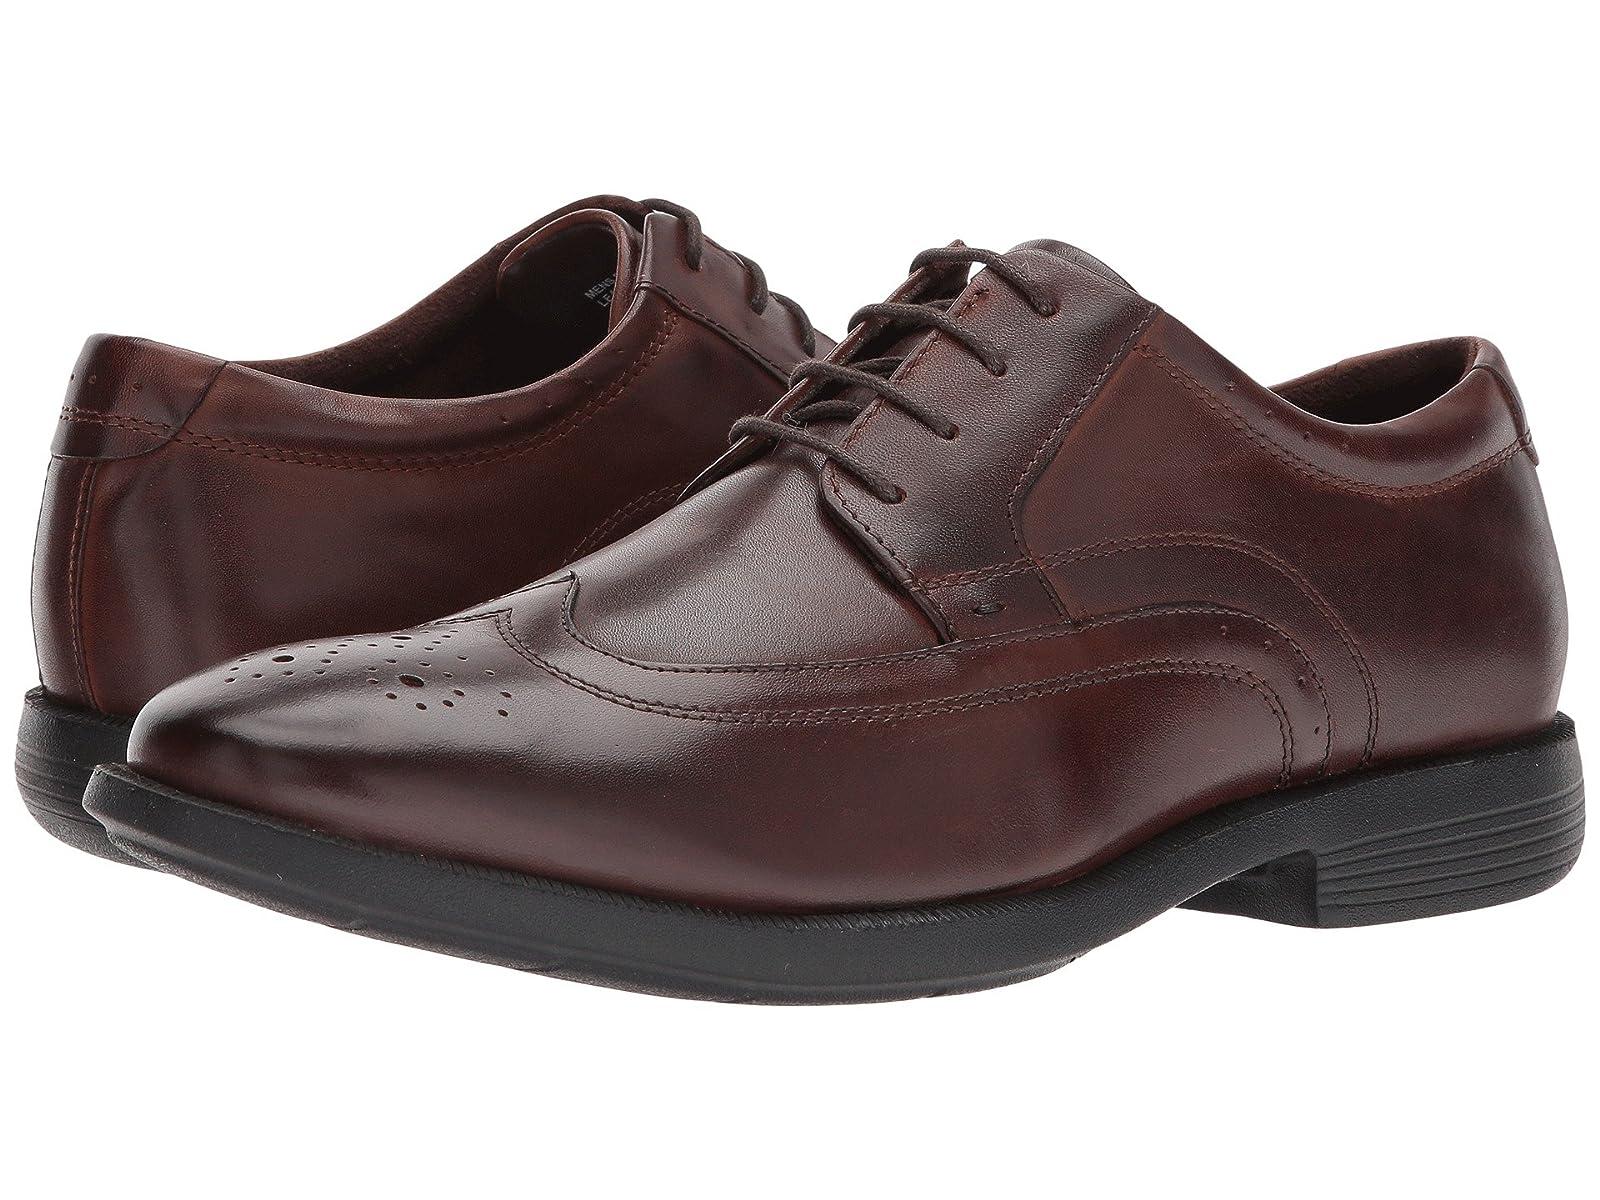 Nunn Bush Decker Wingtip Oxford with KORE Walking Comfort TechnologyAtmospheric grades have affordable shoes